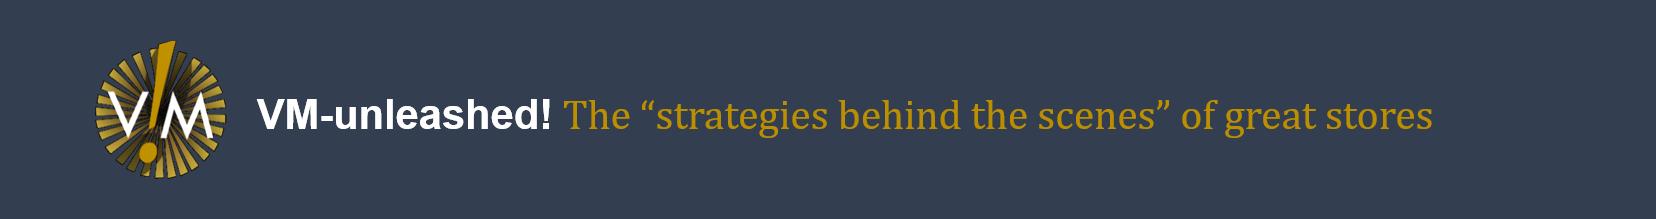 vm-unleashed-strategies-behind-the-scenes